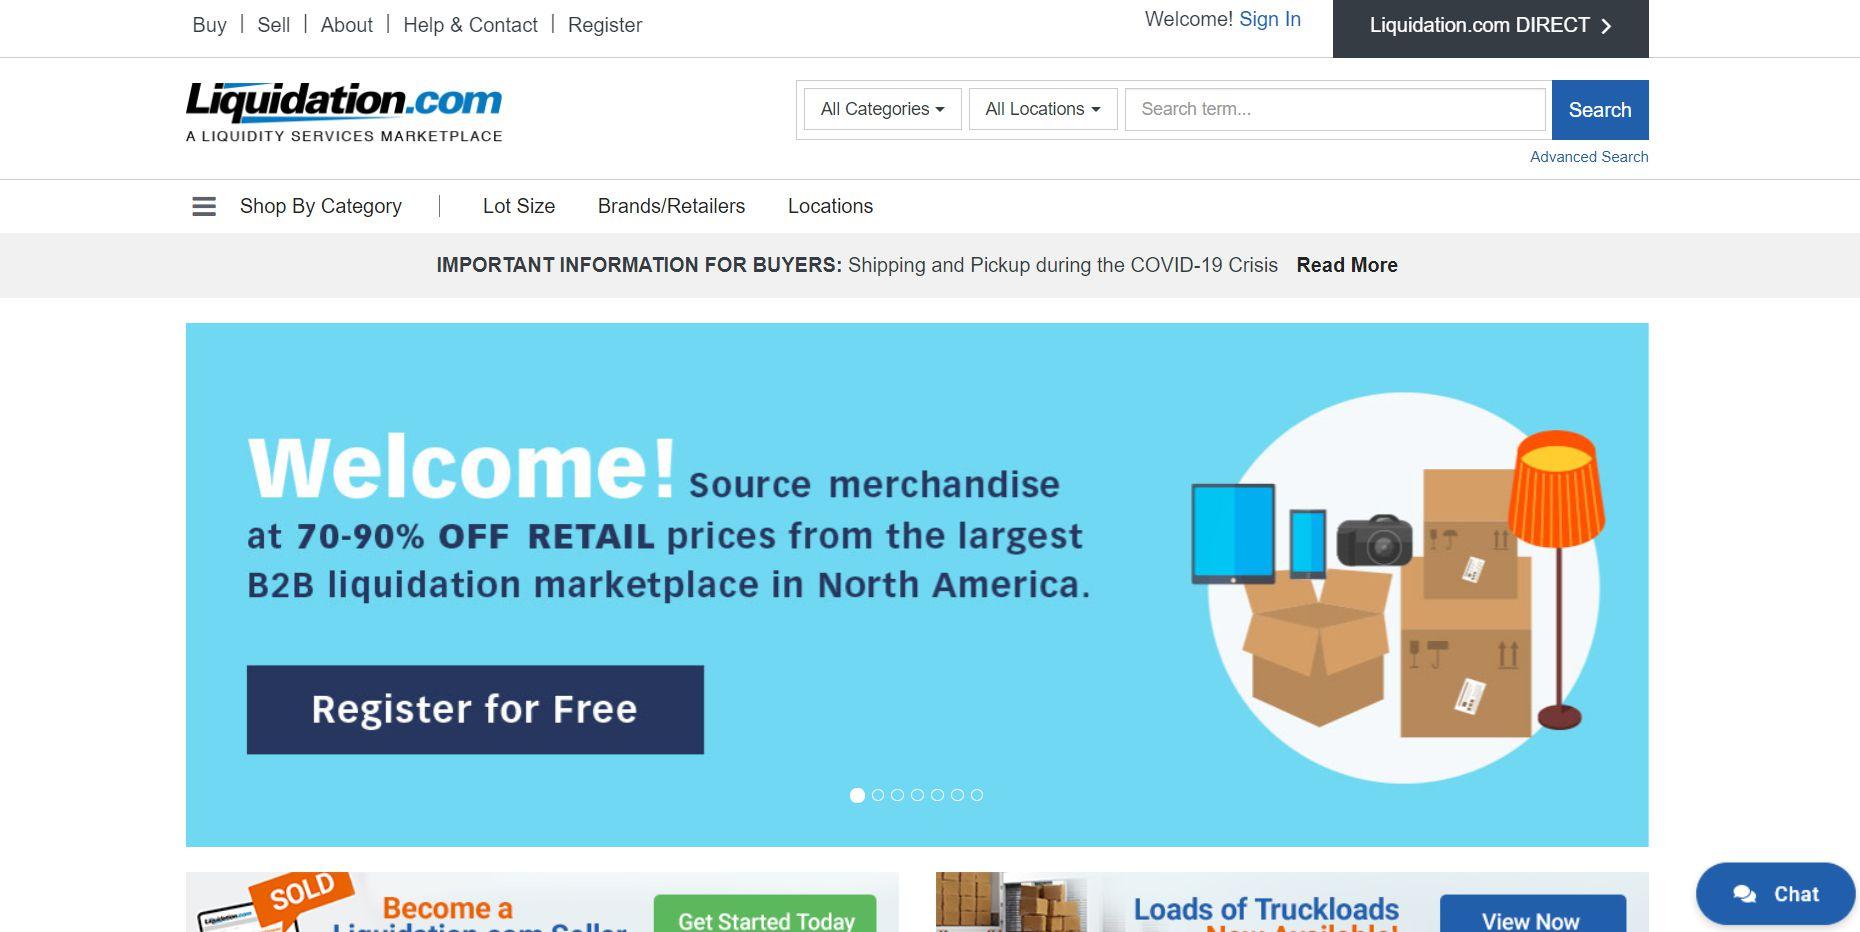 The homepage of Liquidation.com